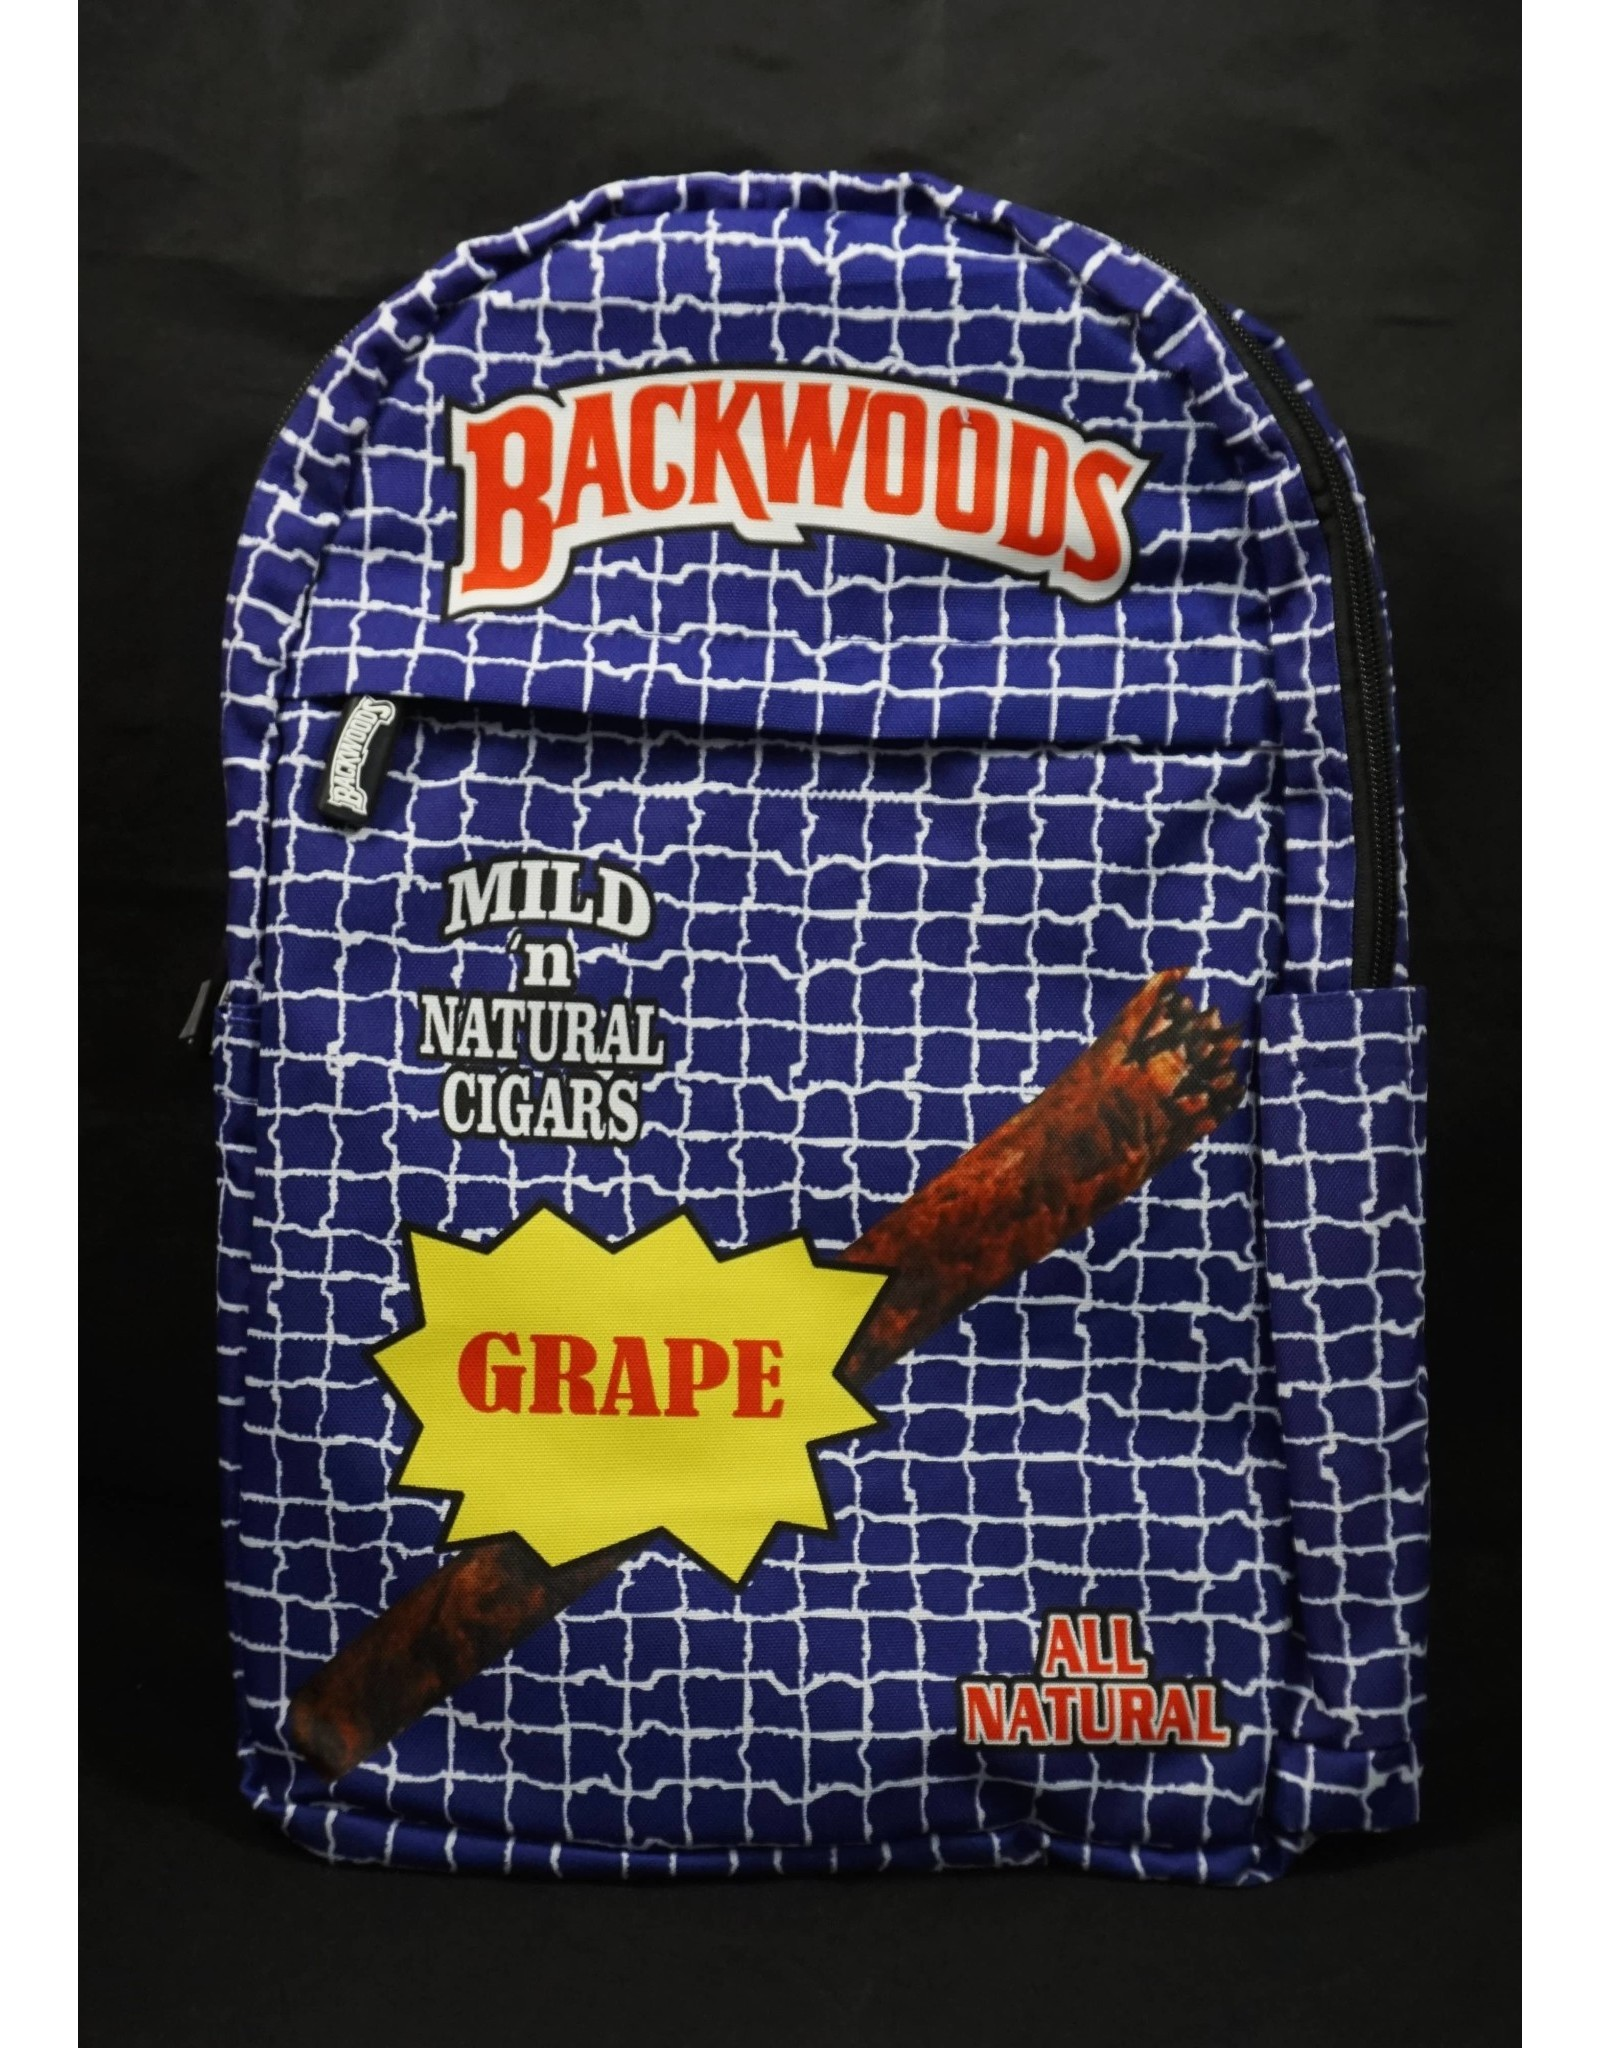 Backwoods Backpack - Grape